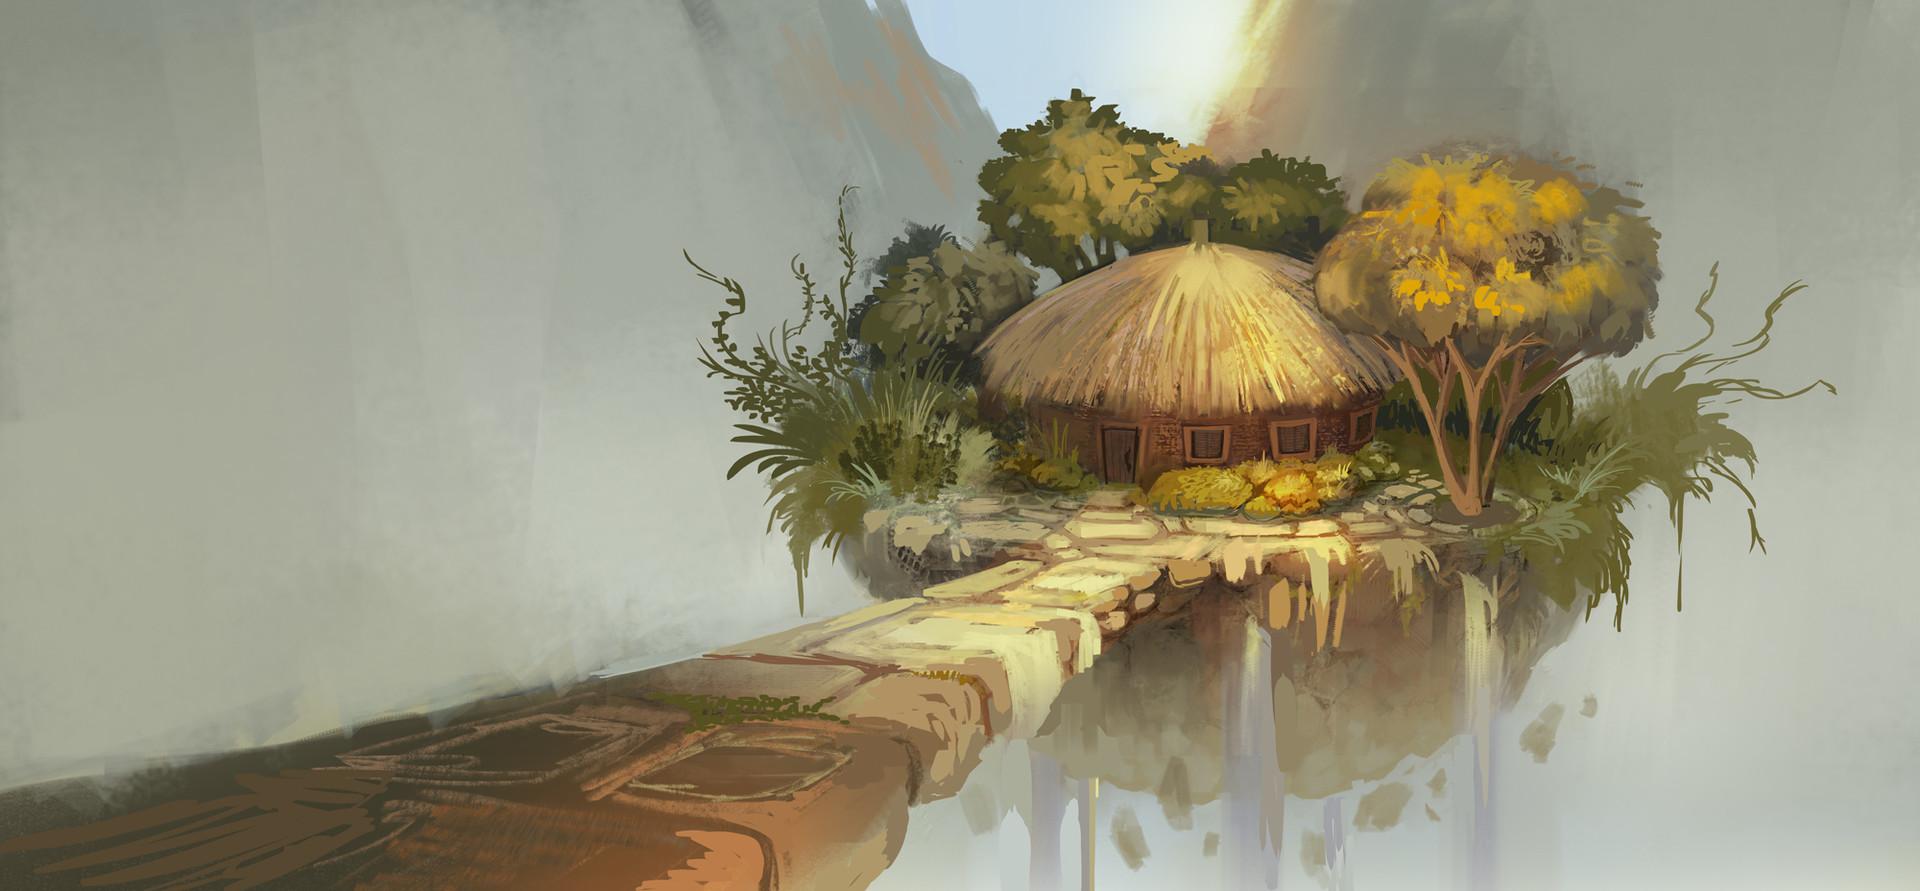 Casey gustafson floating hut